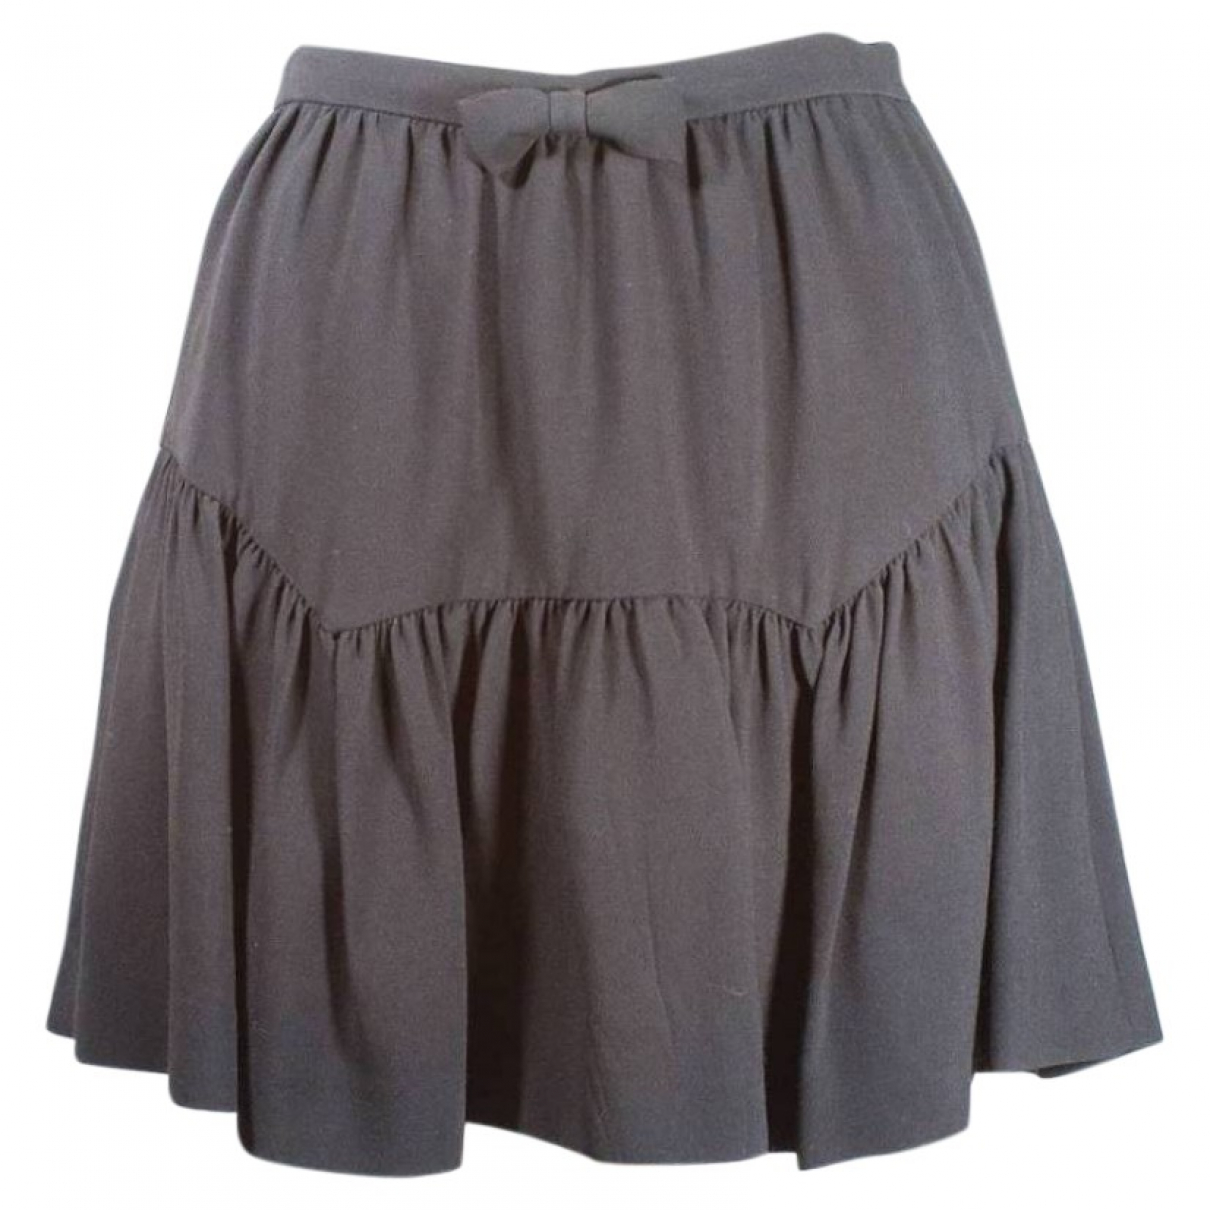 Miu Miu \N Black skirt for Women M International